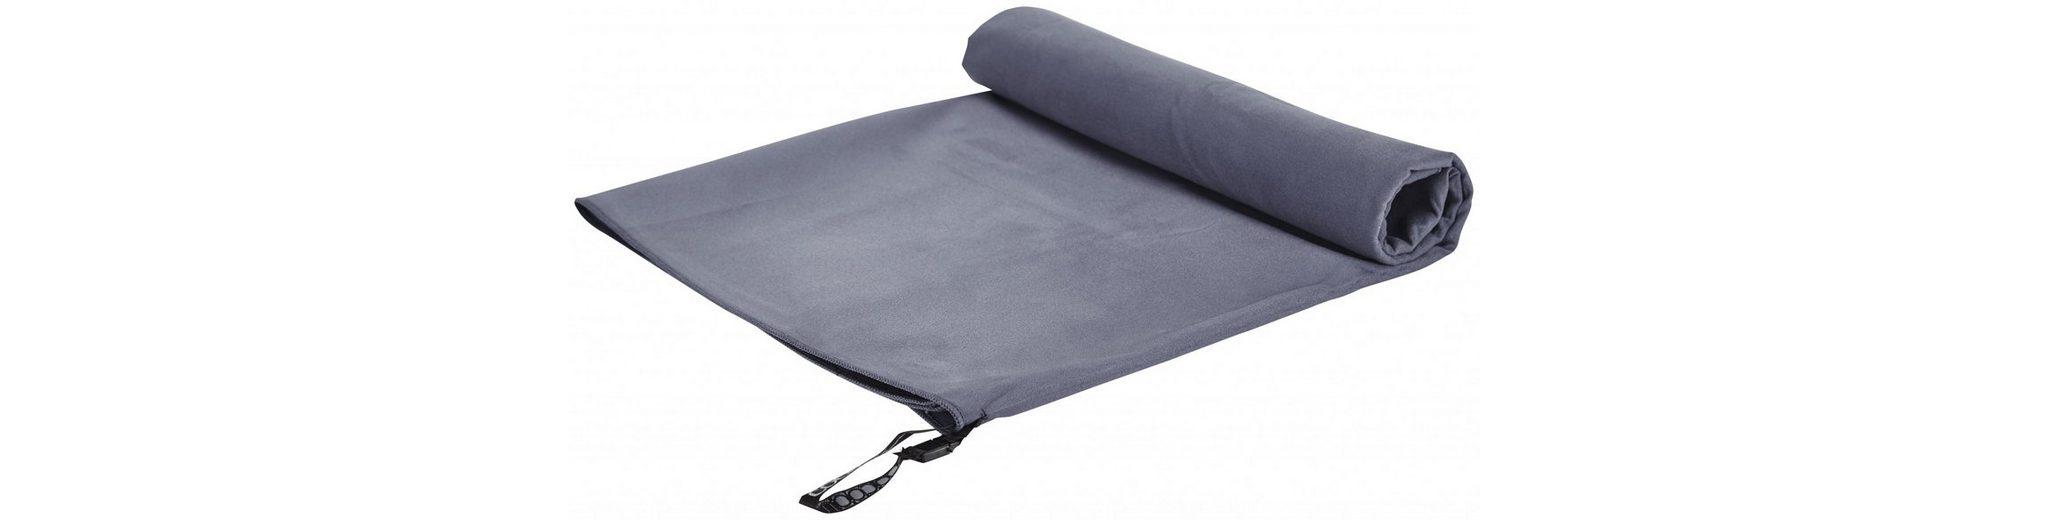 Cocoon Reisehandtuch »Microfiber Towel Ultralight X-Large«